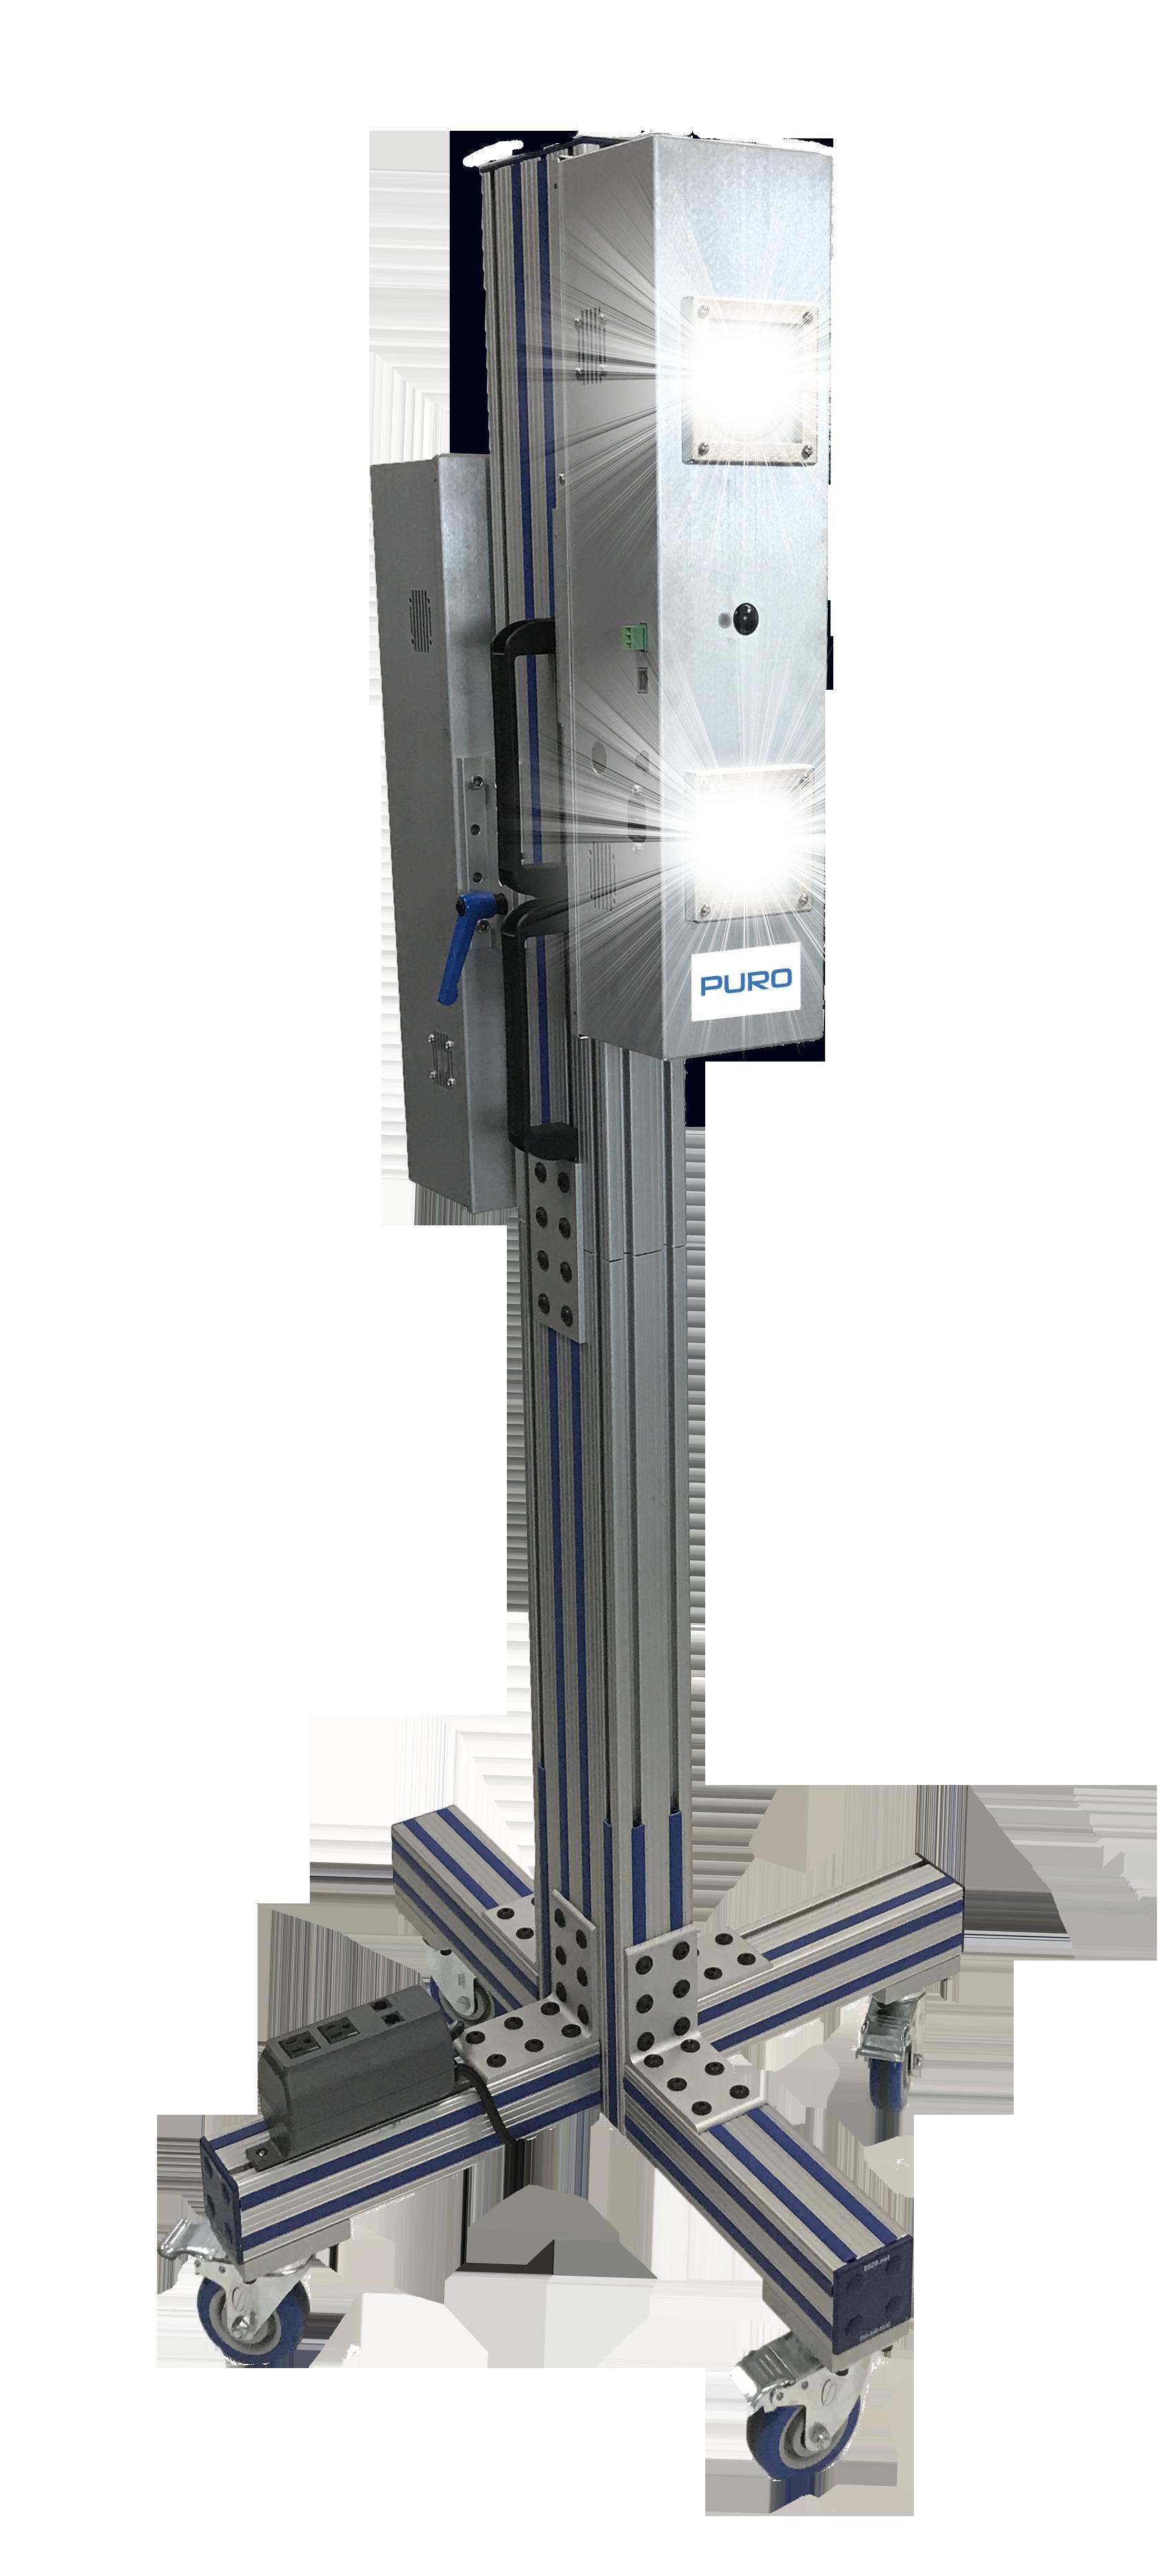 PURO Sentry M4 Mobile UV Light Fixture – Quad UV Lights on Casters